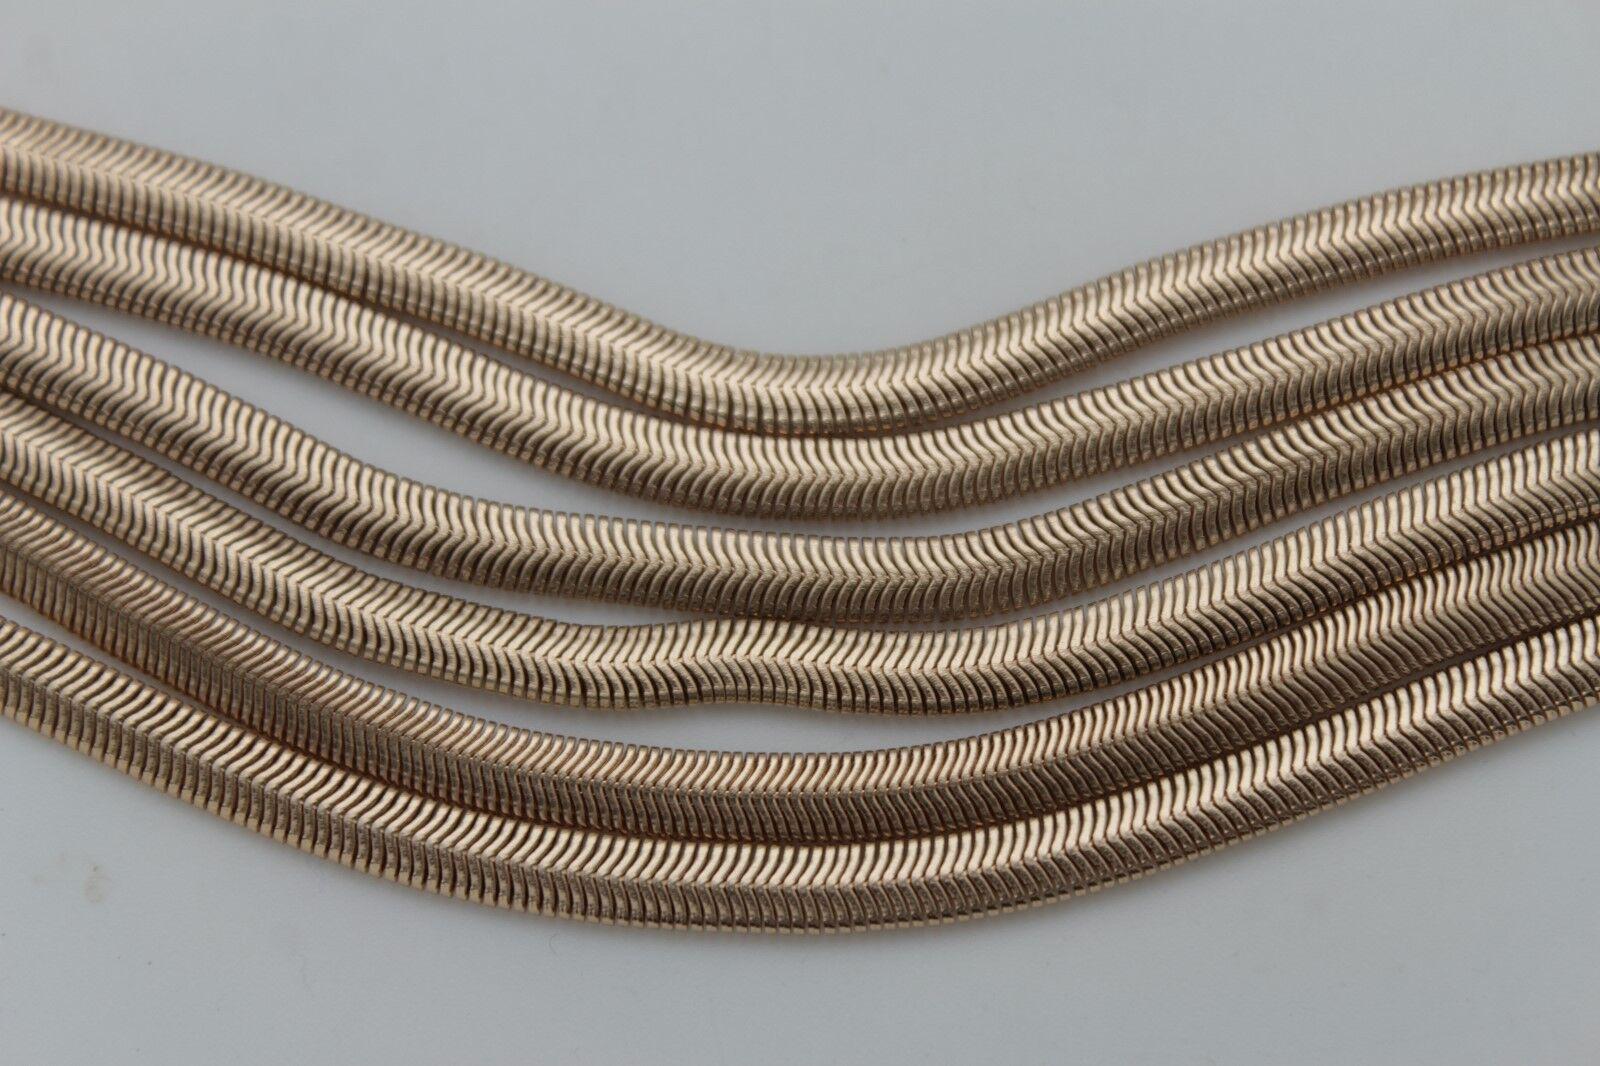 Women Western Fashion Boot Bracelet Gold Mesh Metal Chain 5 Strands Shoe Charm